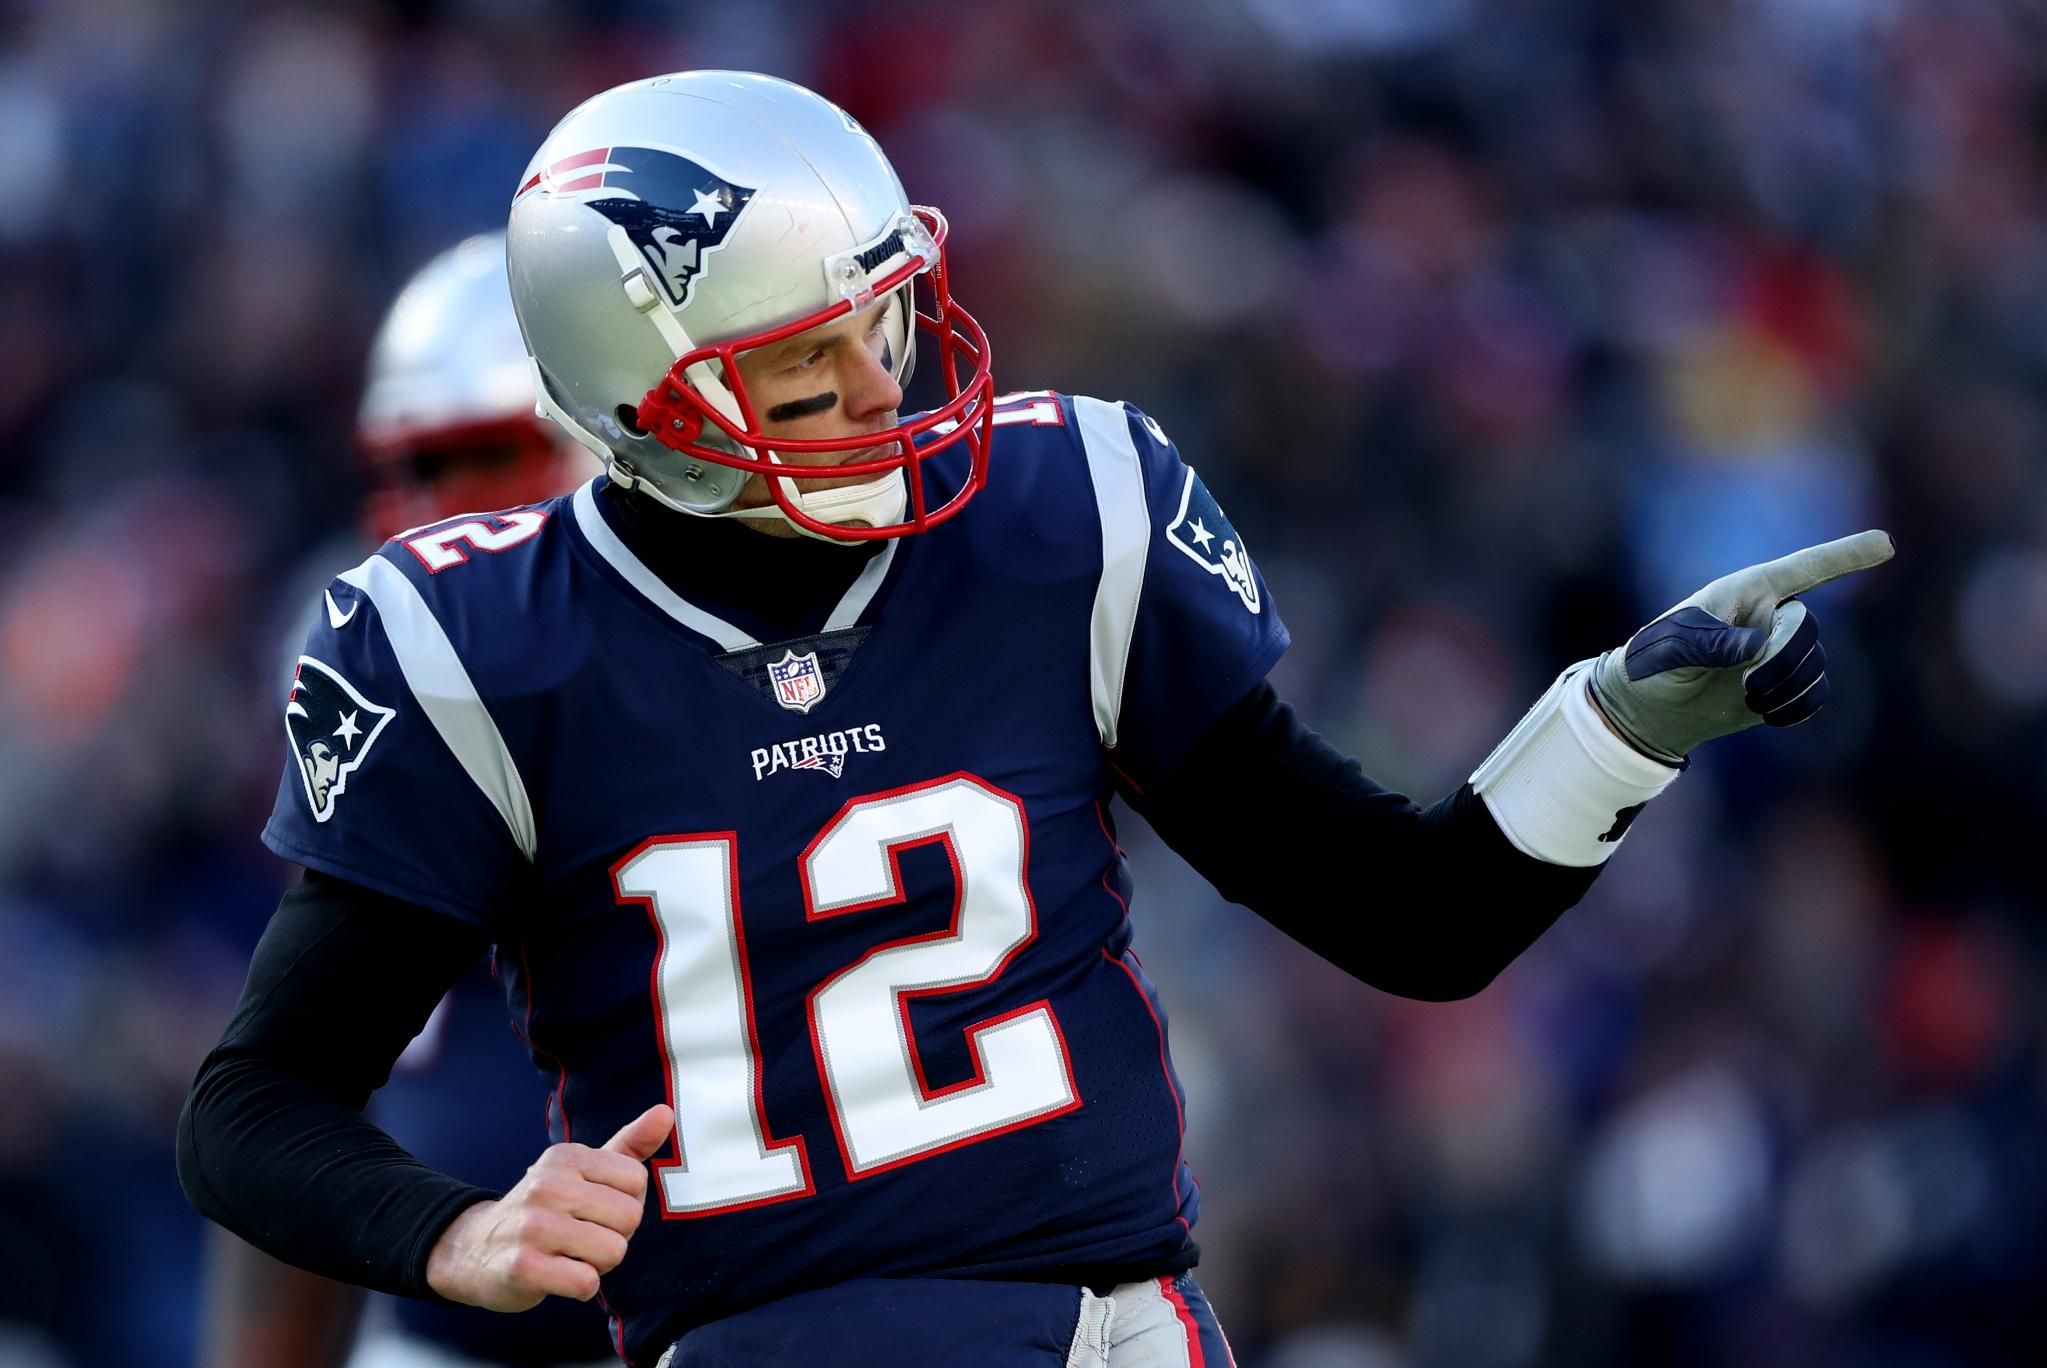 Las Vegas NFL Odds on Potential Super Bowl Matchups Favor